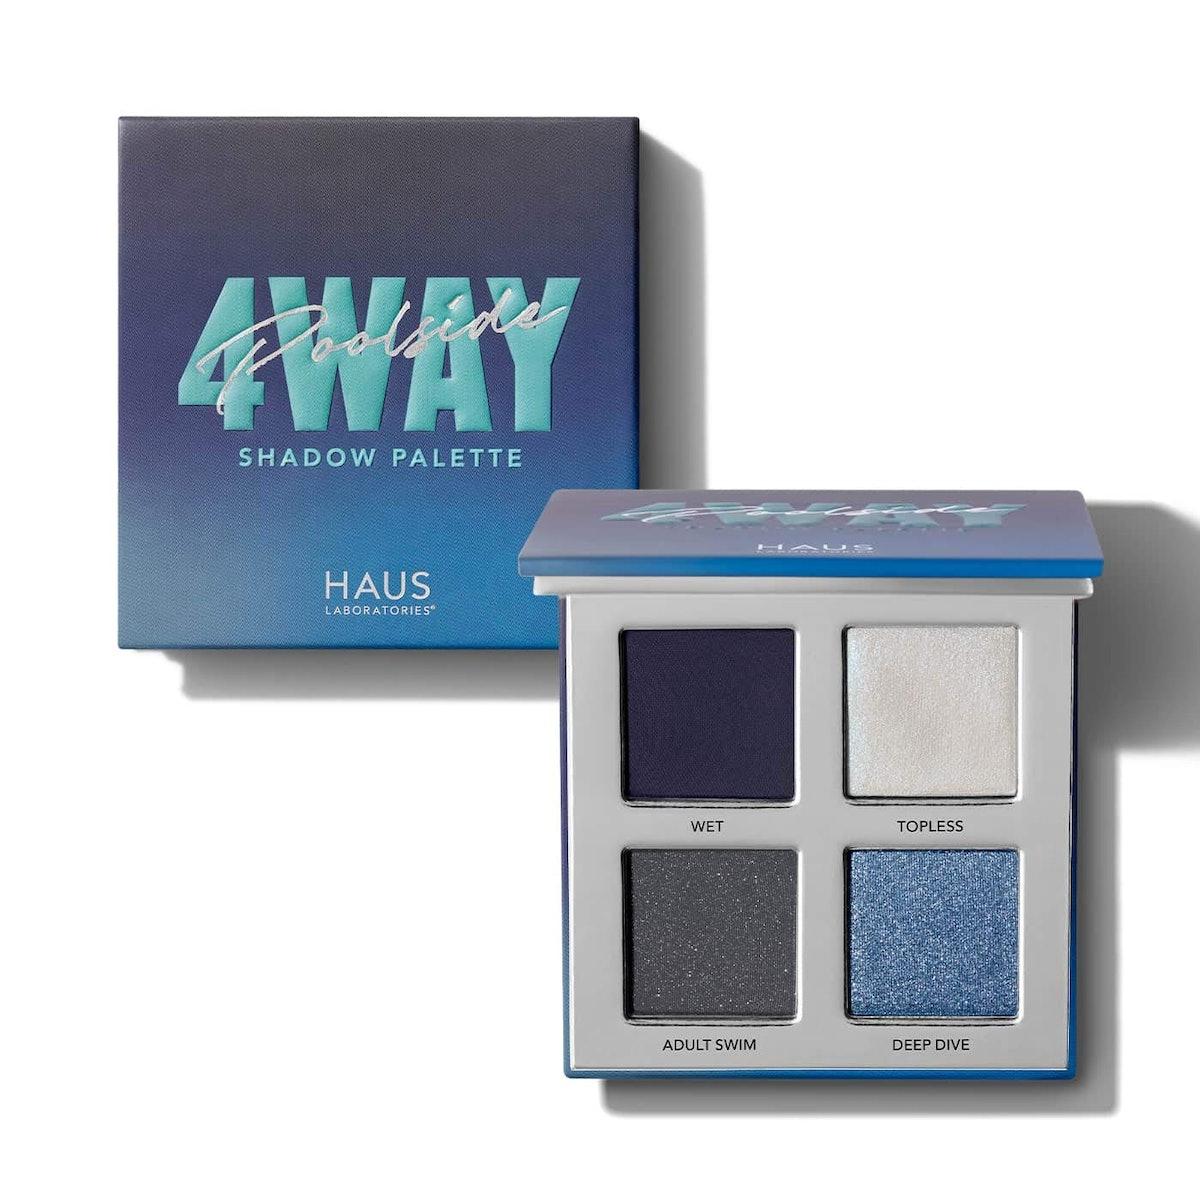 Haus Laboratories Four-Way Shadow Palette in Poolside